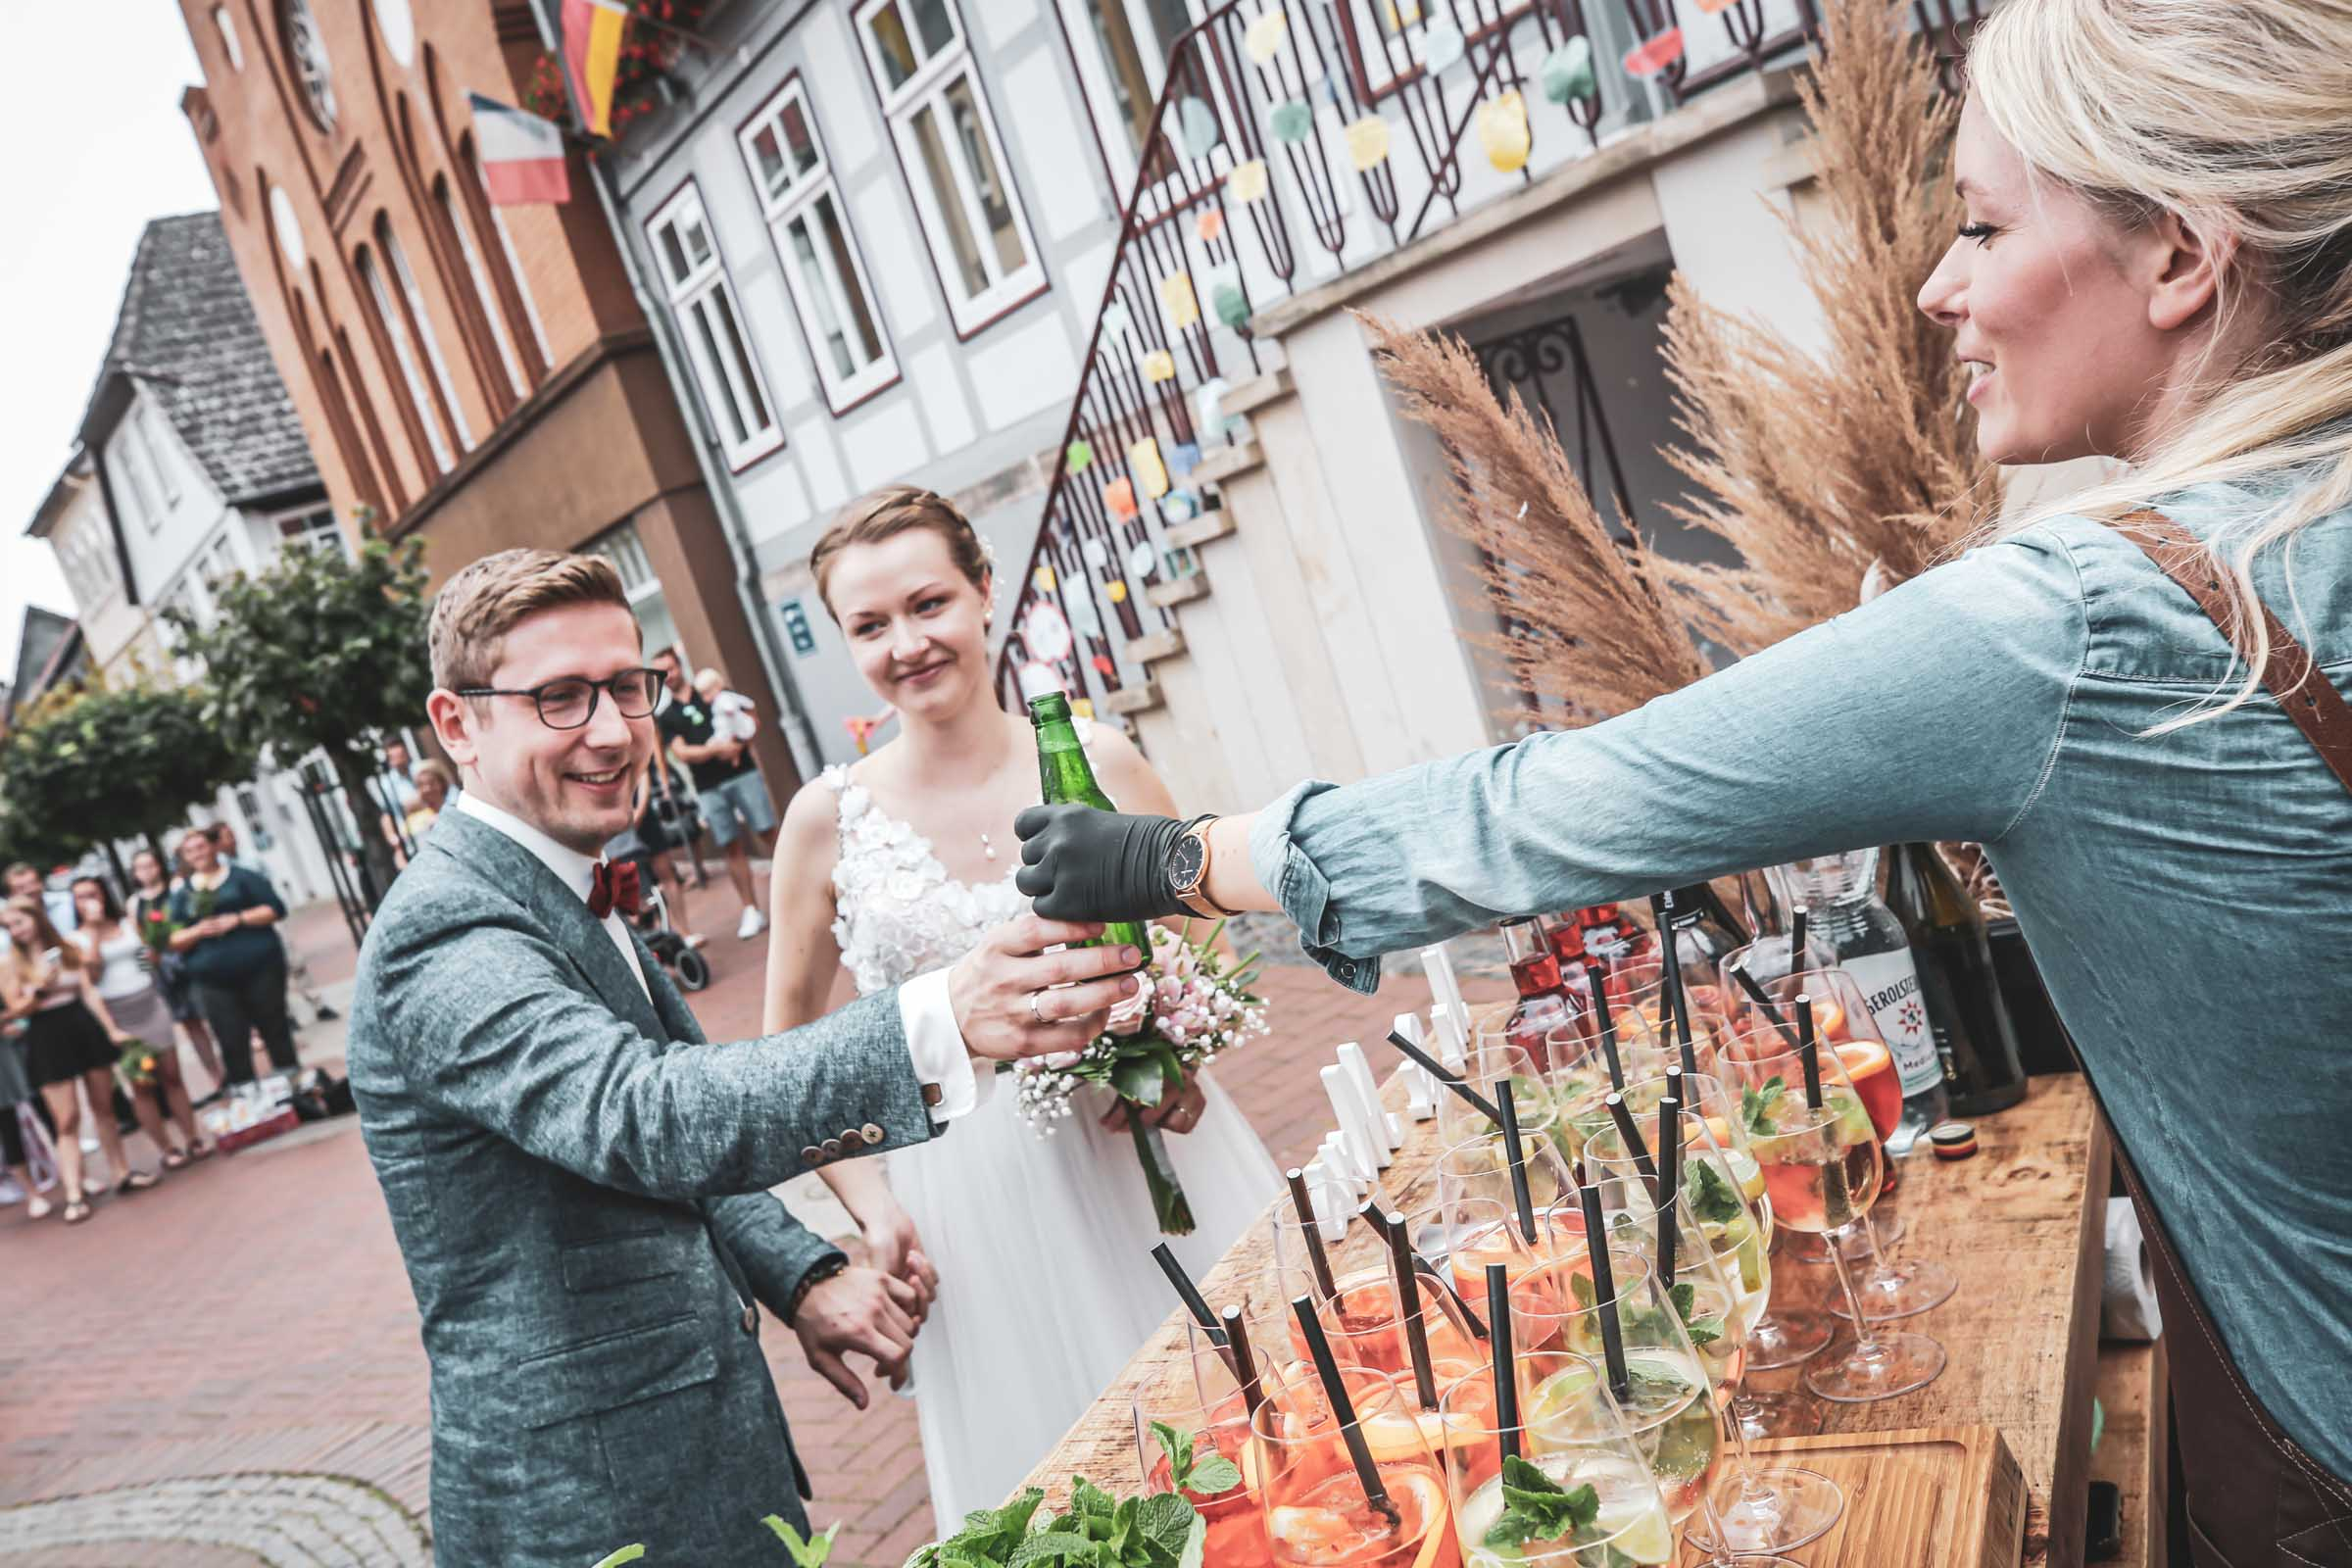 Cocktailservice | Hannover | Mobile | Bar | Bulli | VW | Barformat | Hochzeit | Trauung | Standesamt | Barkeeper | Getränke | Catering | Cocktails | Sektbar | Sektempfang | Buchen | Mieten | Anfragen